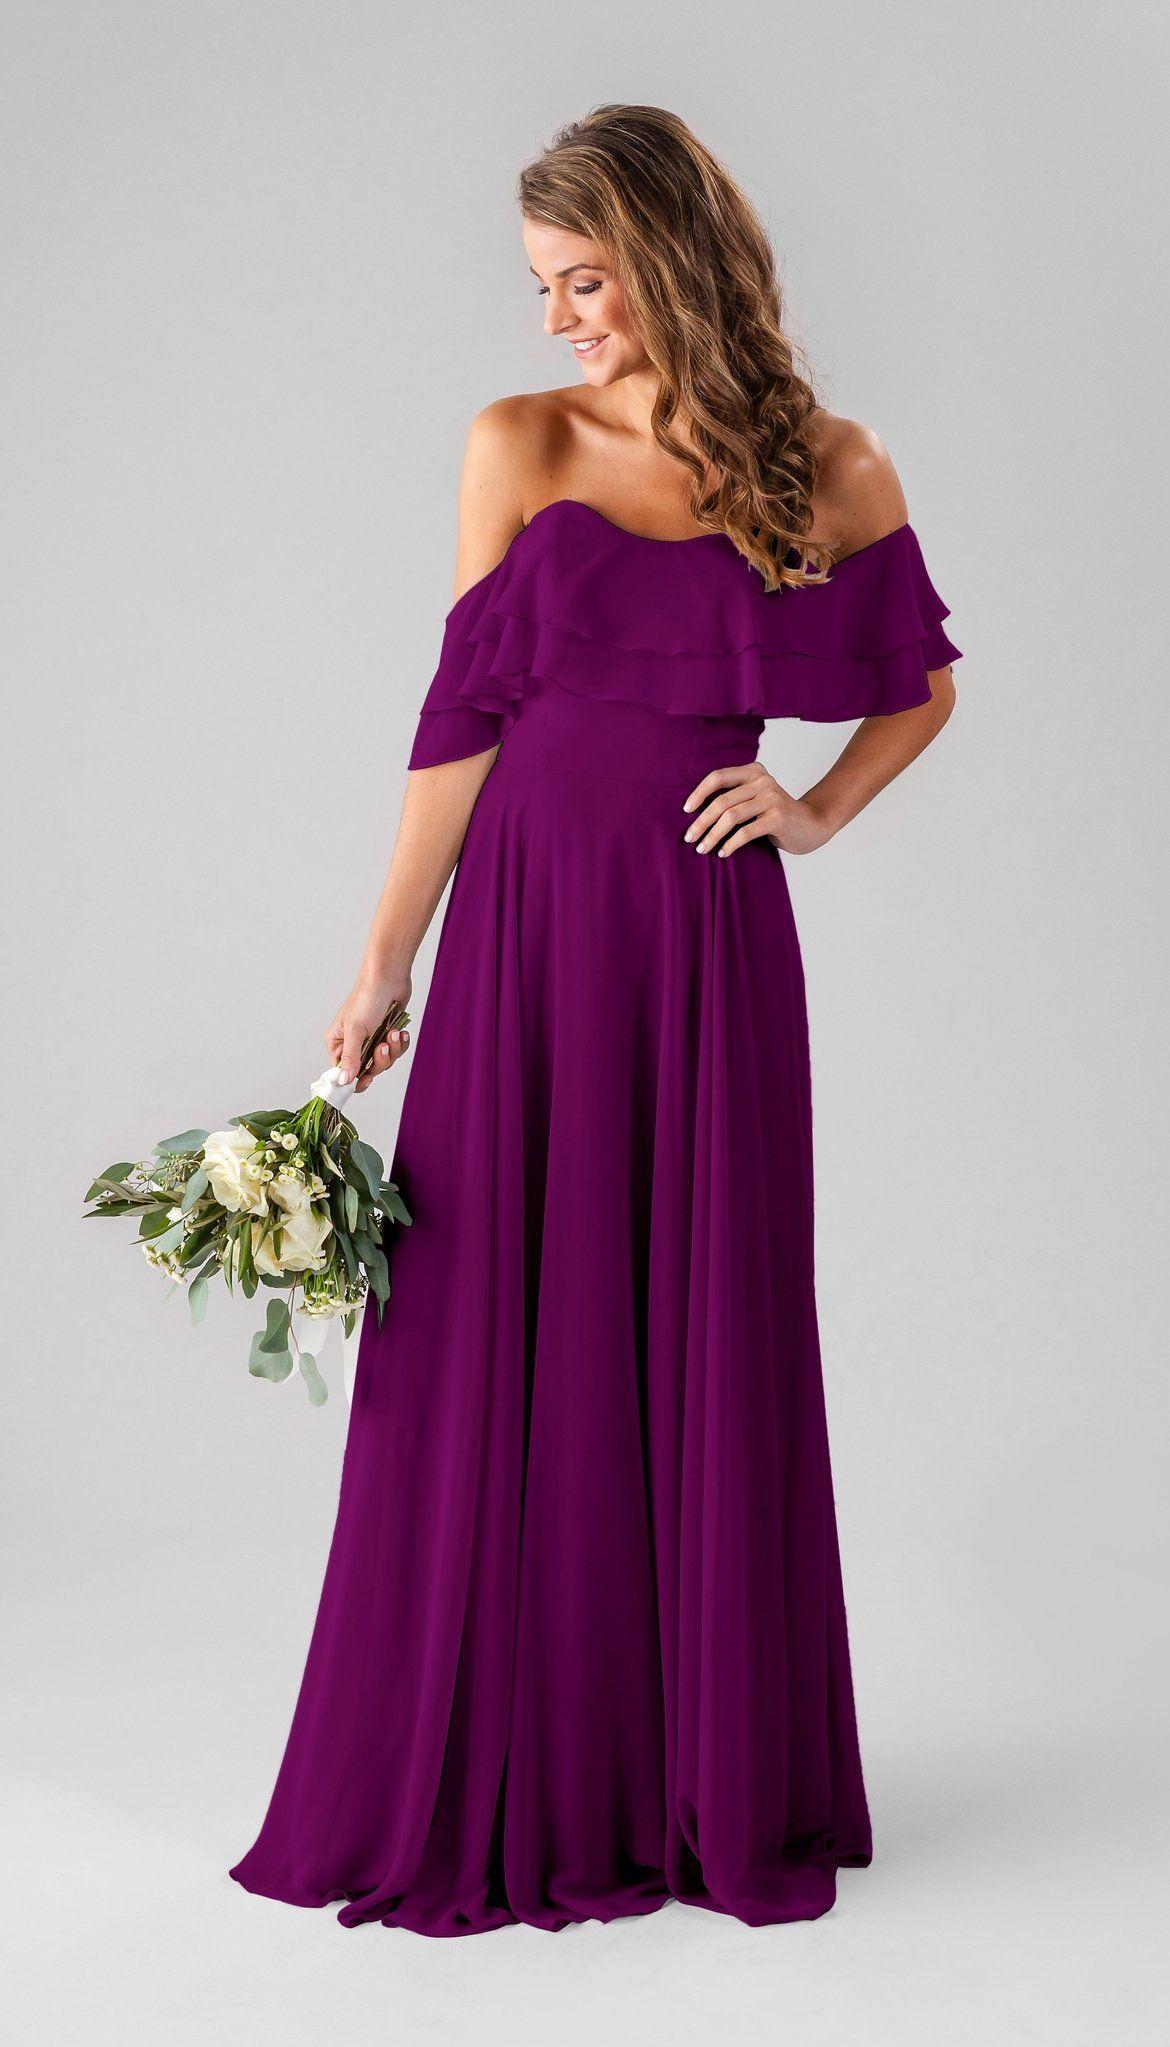 Allison products pinterest wedding bridesmaid dresses and dresses